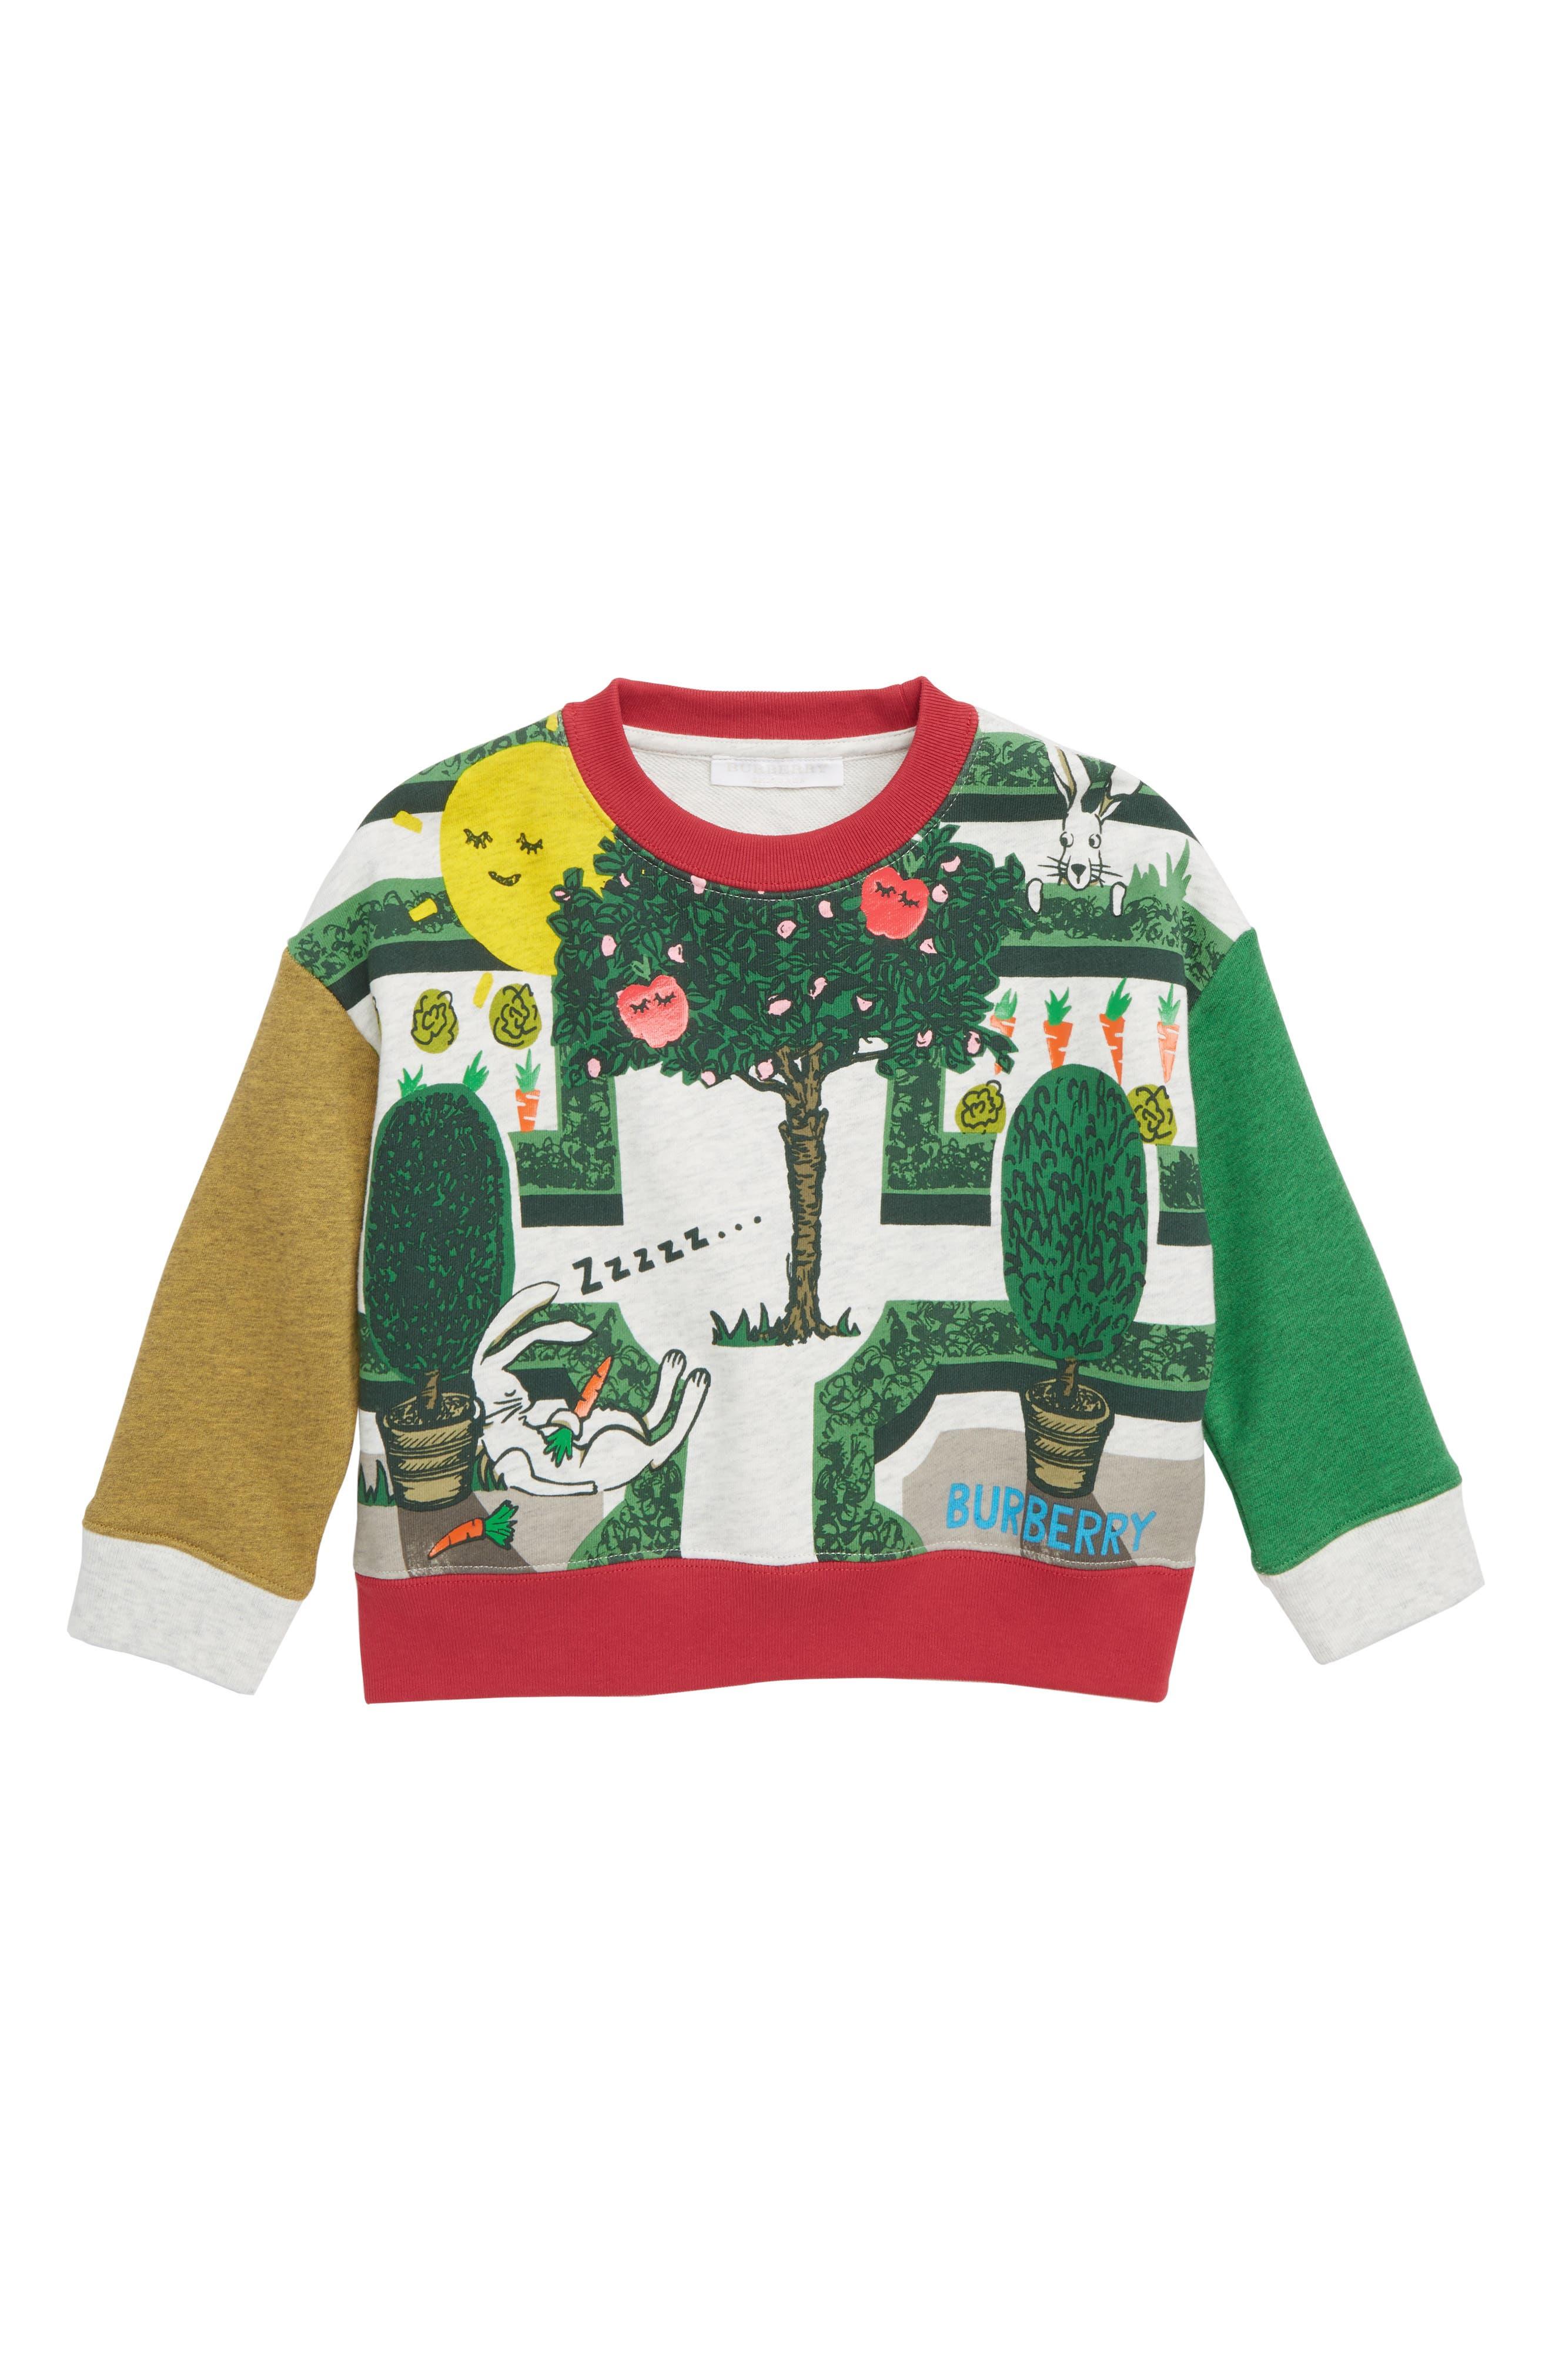 Toddler Girls Burberry Hedge Maze Graphic Sweatshirt Size 6Y  White